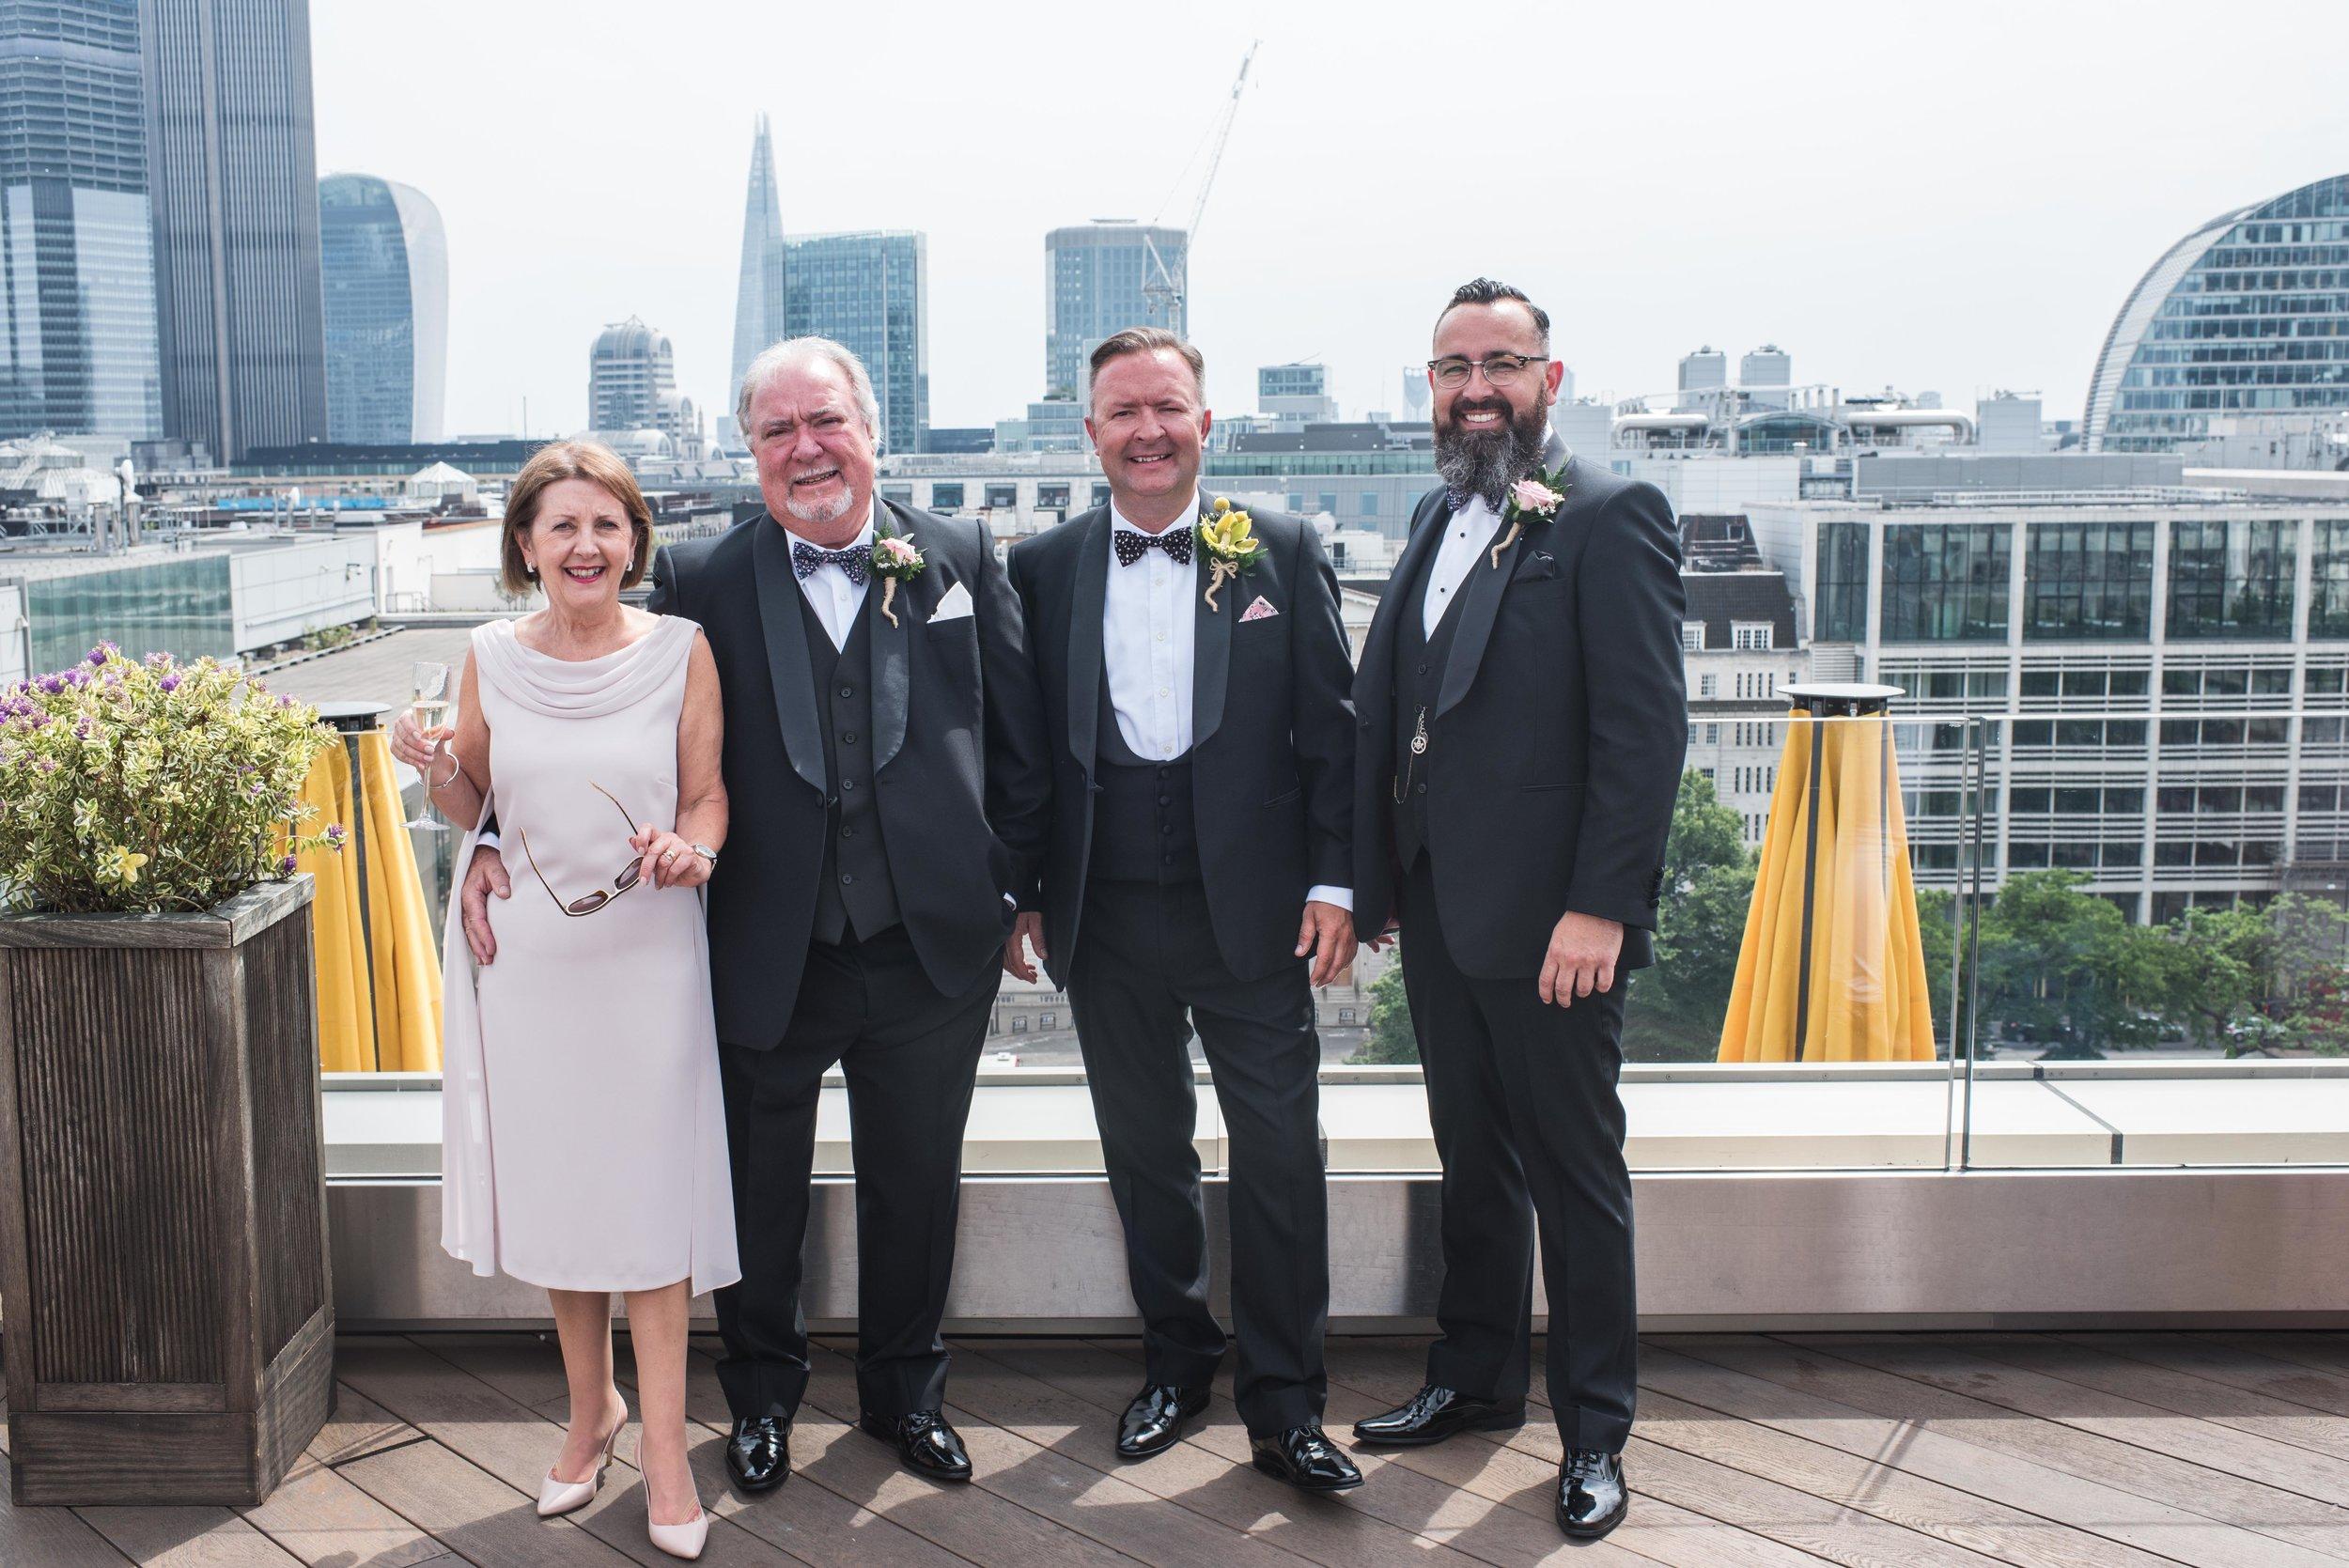 D&M_Marylebone Town Hall Wedding (29 of 239).jpg